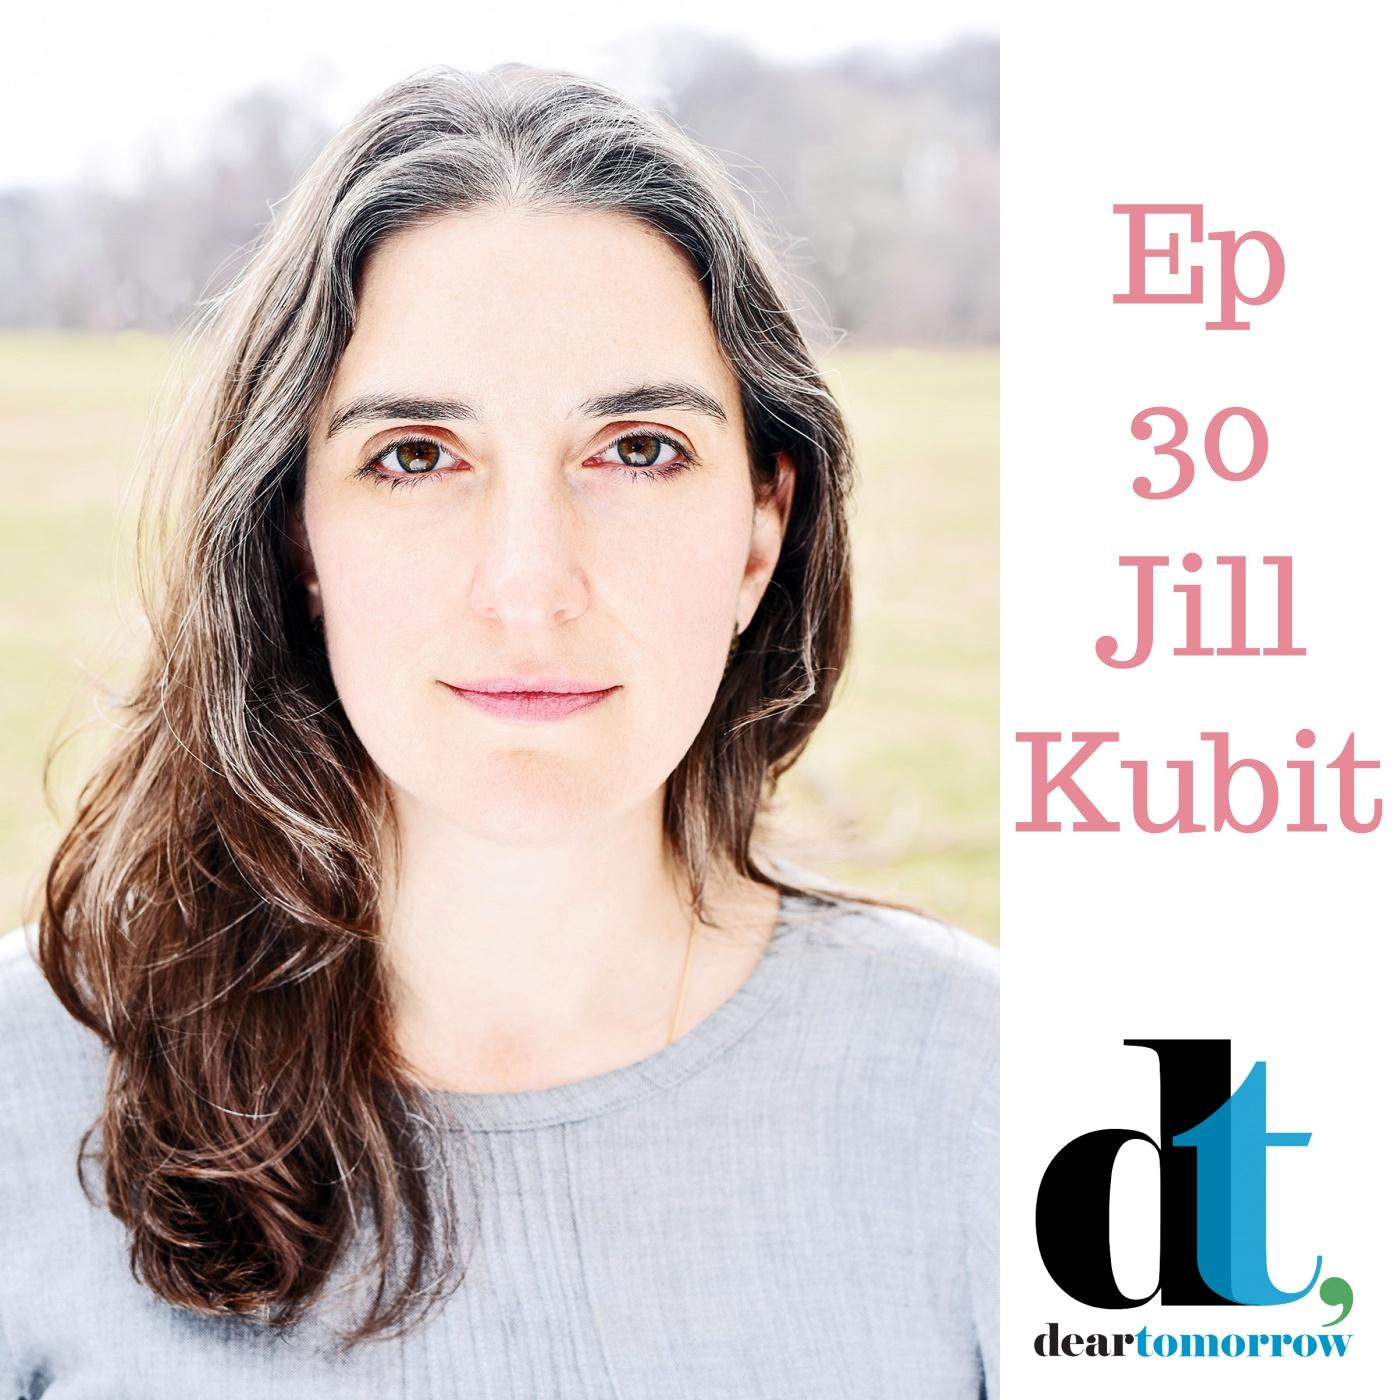 Ep. 30 Jill Kubit: DearTomorrow Personalizes Climate Change